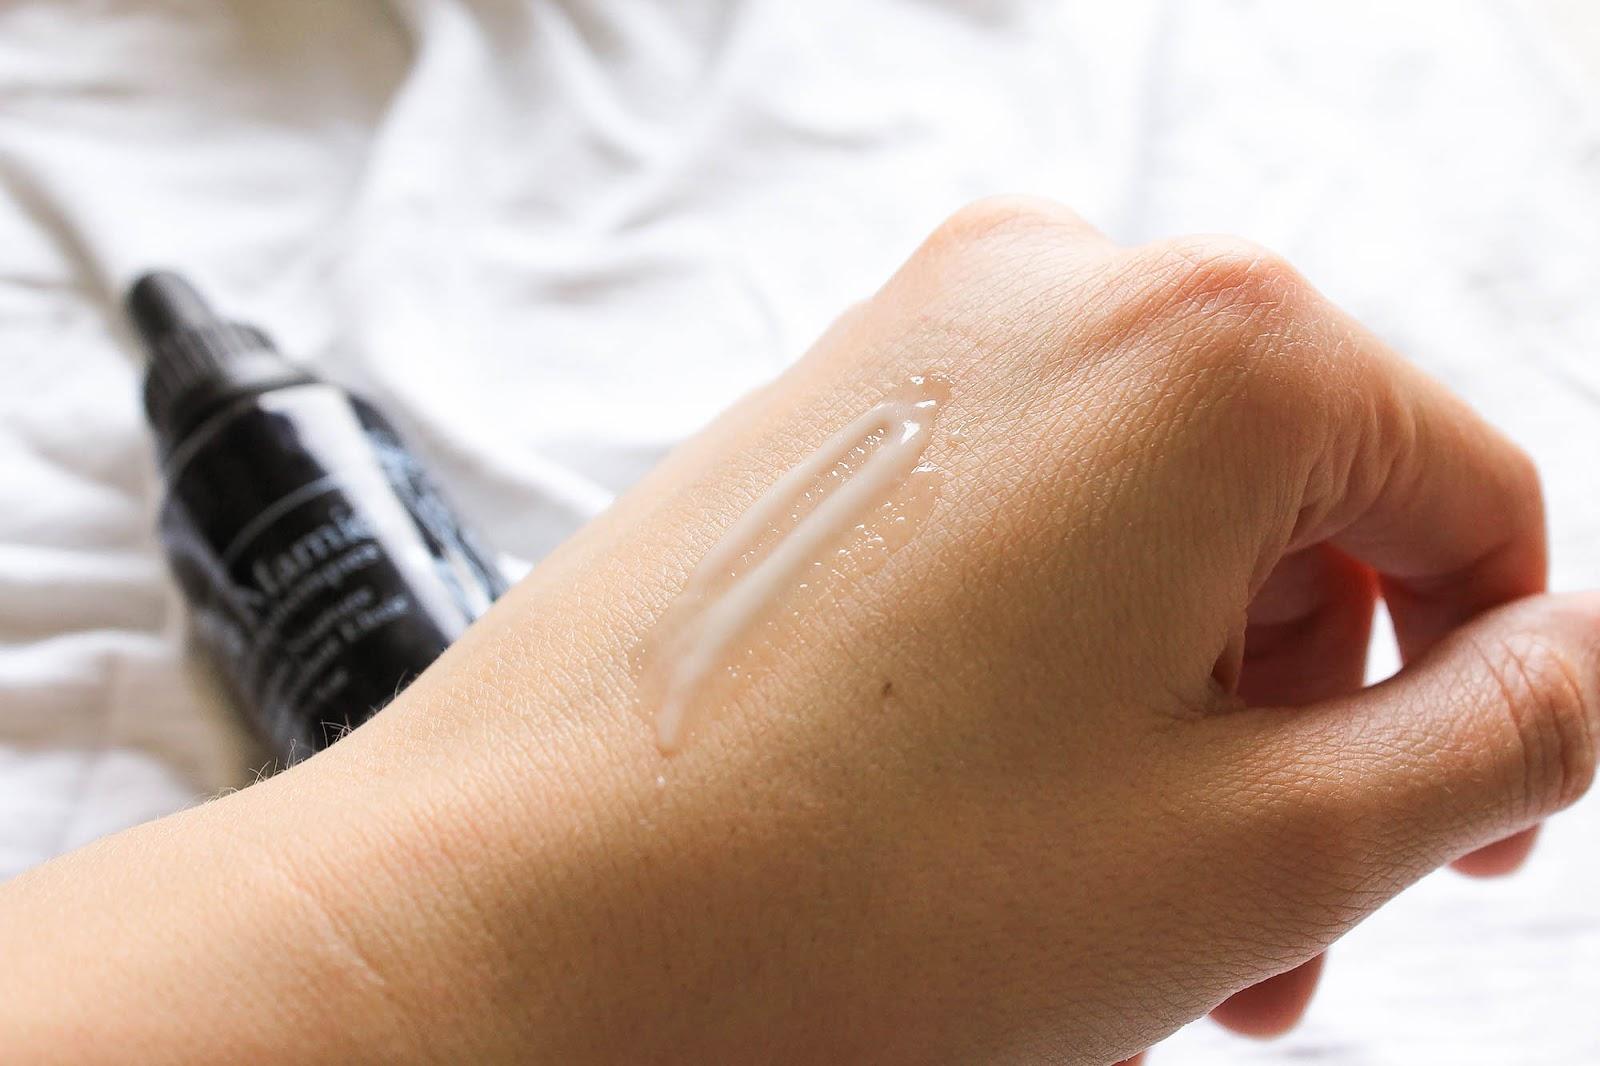 de Mamiel Intense Nurture Antioxidant Elixir Beauty Heroes 2018. Texture. Serum.